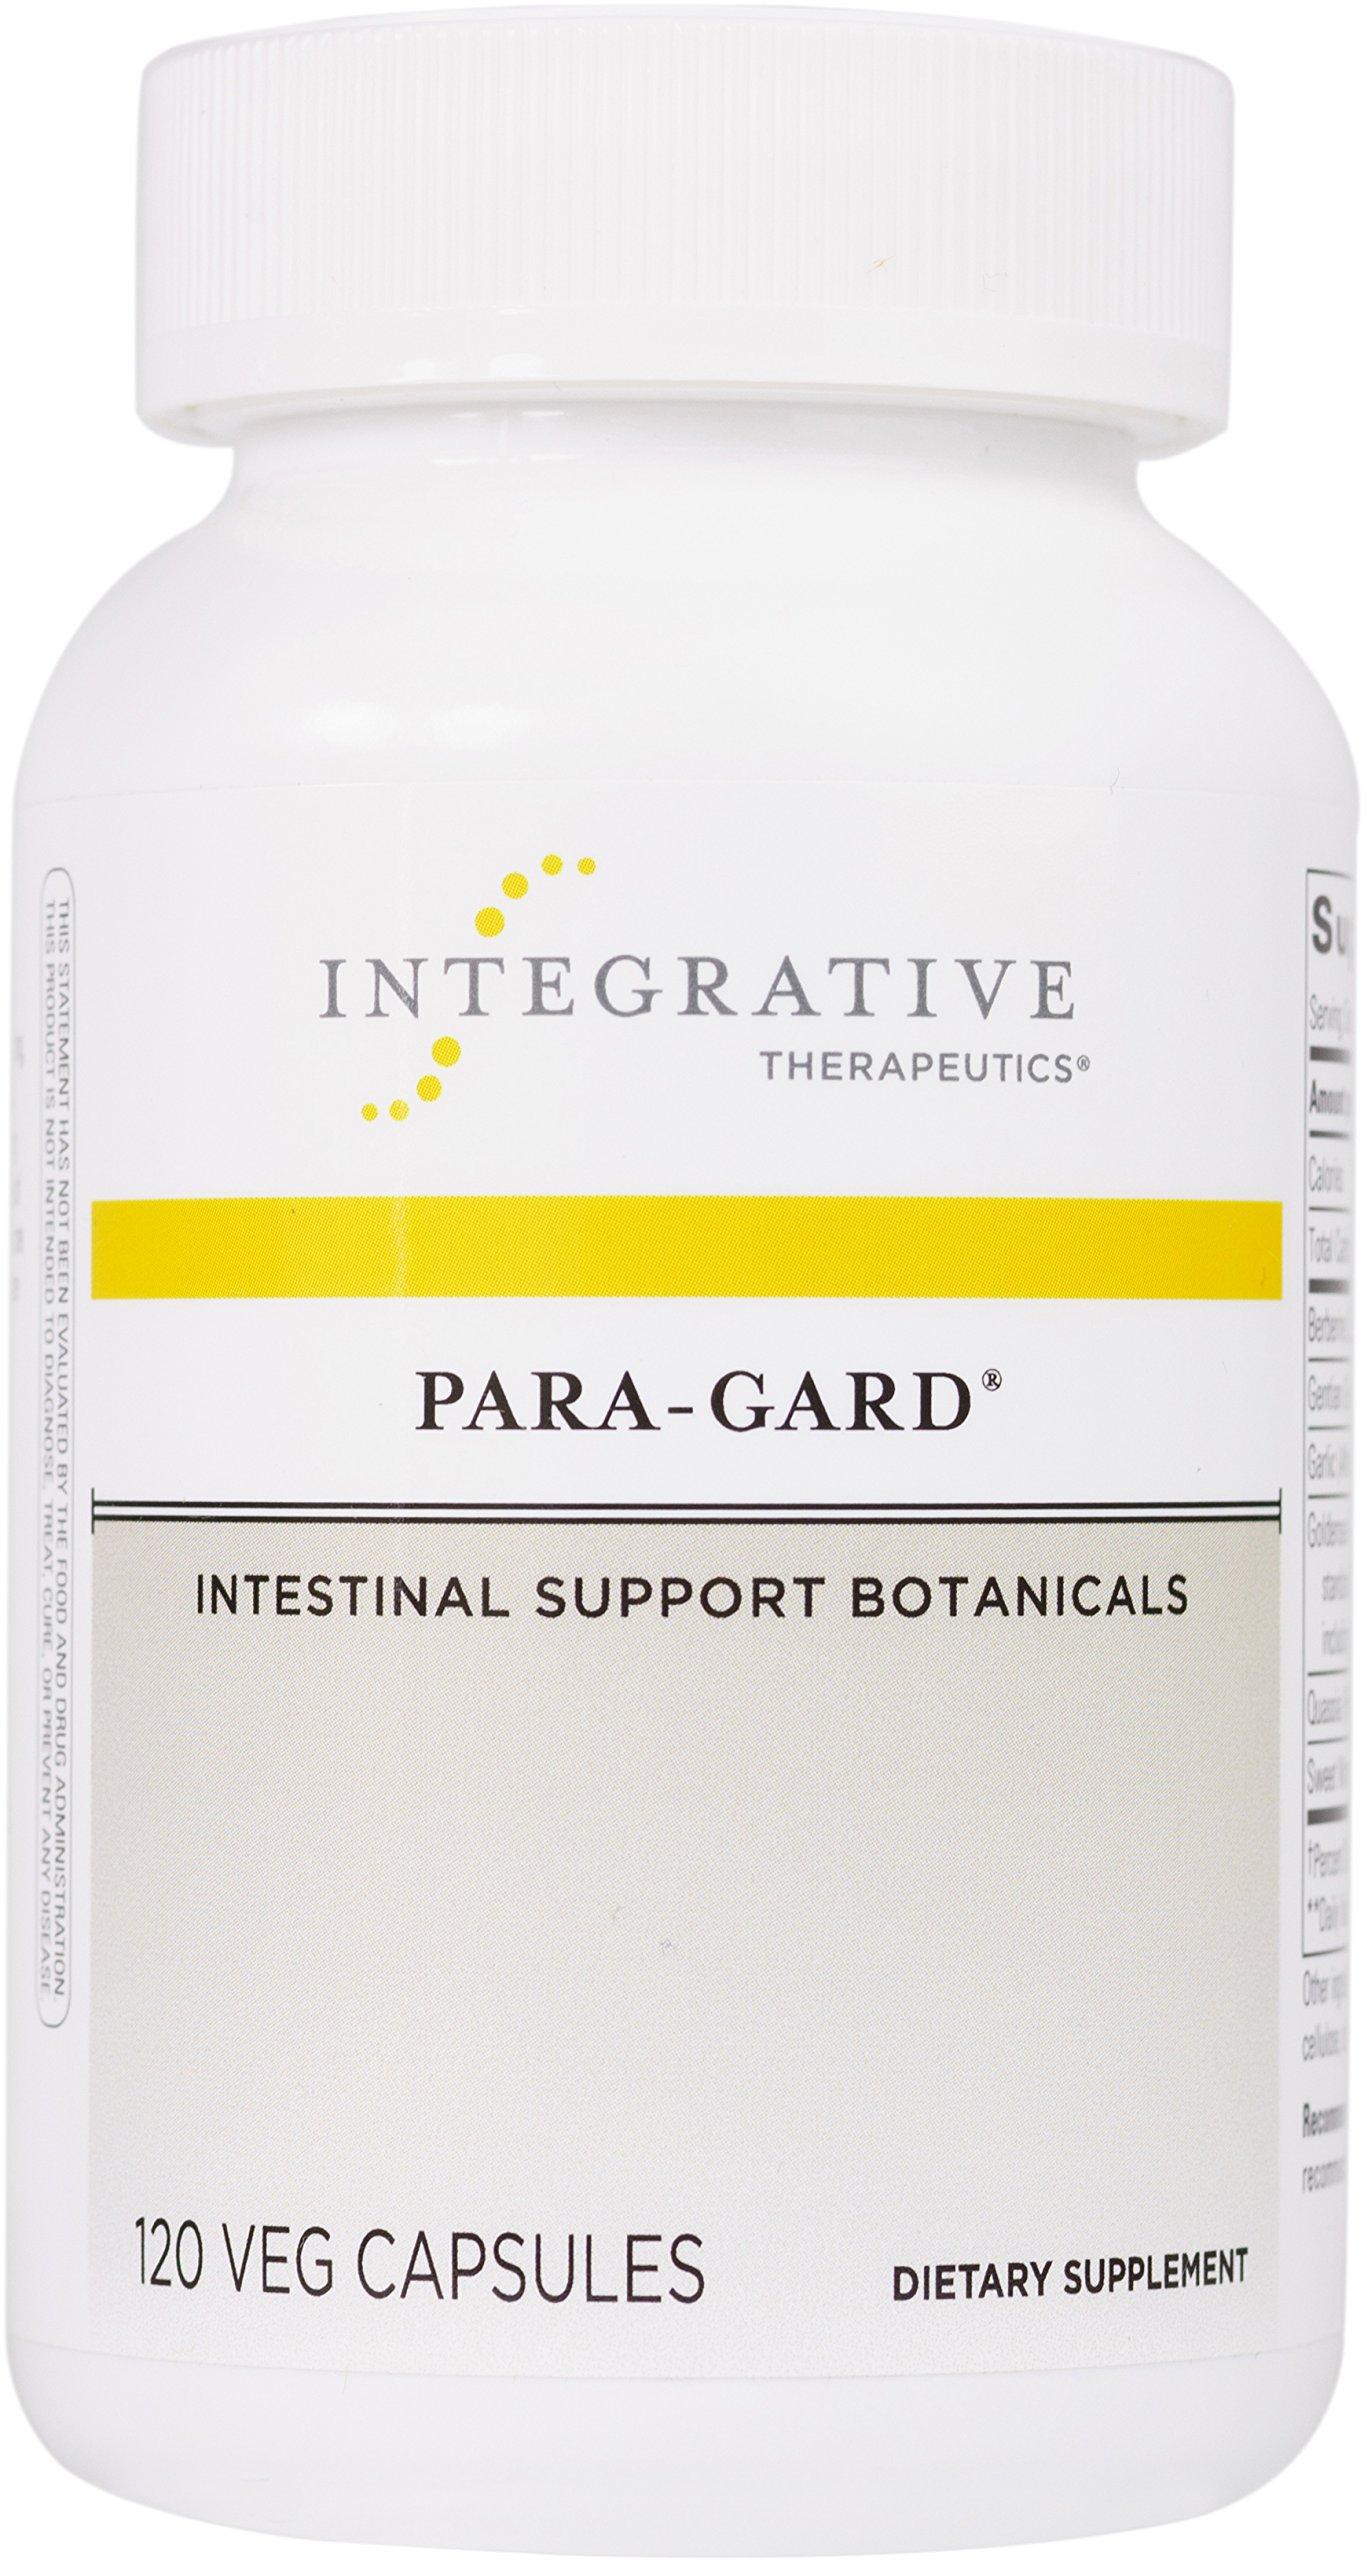 Integrative Therapeutics - Para-Gard - Intestinal Support Botanicals - 120 Capsules